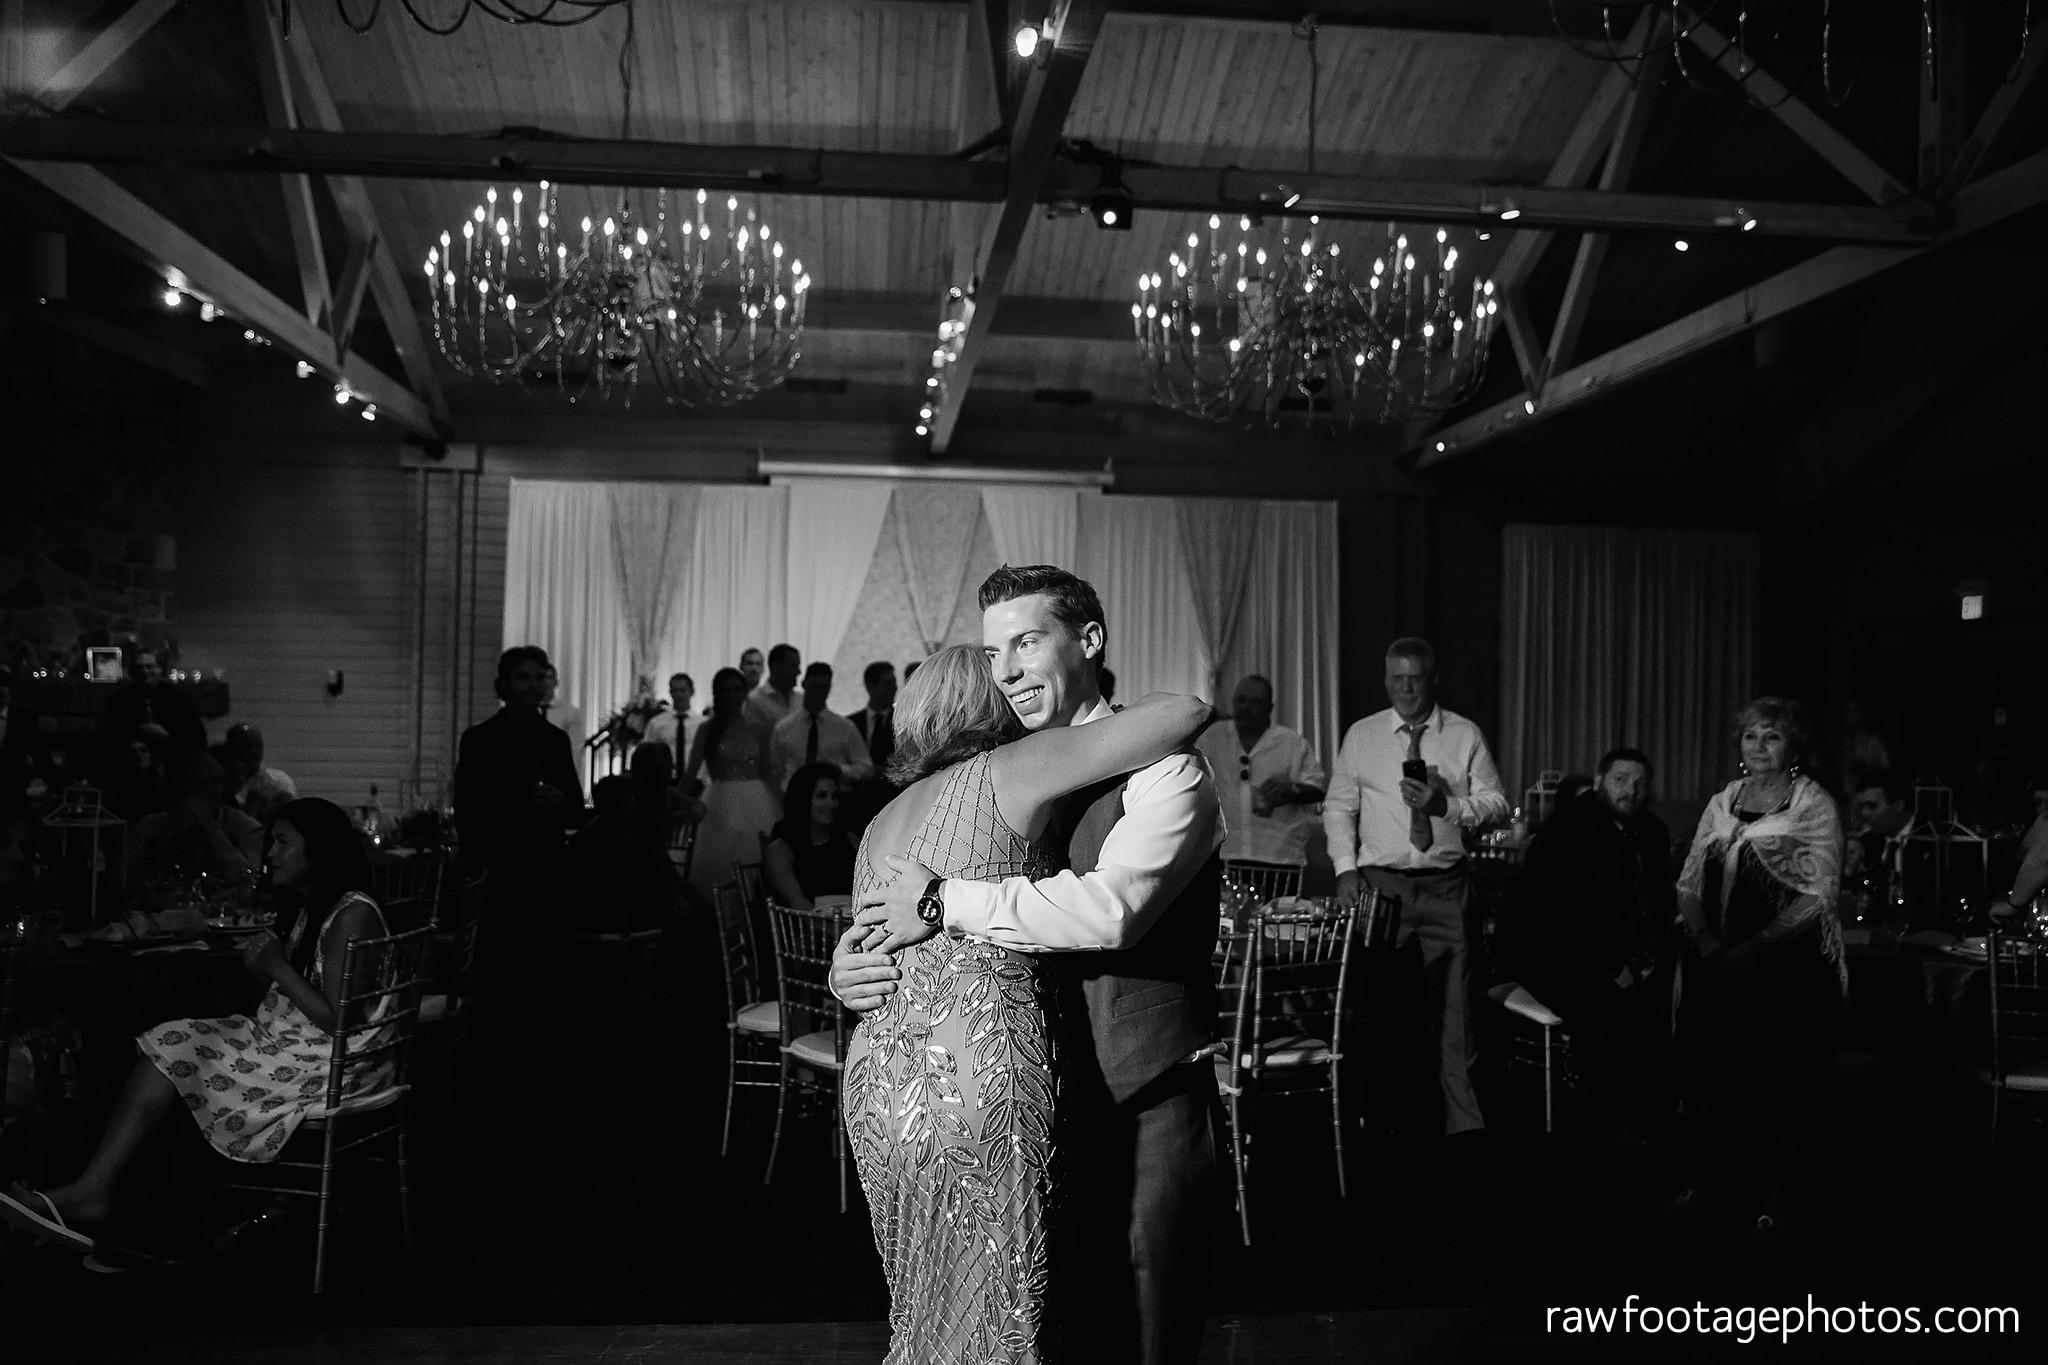 london_ontario_wedding_photographer-grand_bend_wedding_photographer-oakwood_resort_wedding-beach_wedding-sunset_wedding-raw_footage_photography077.jpg